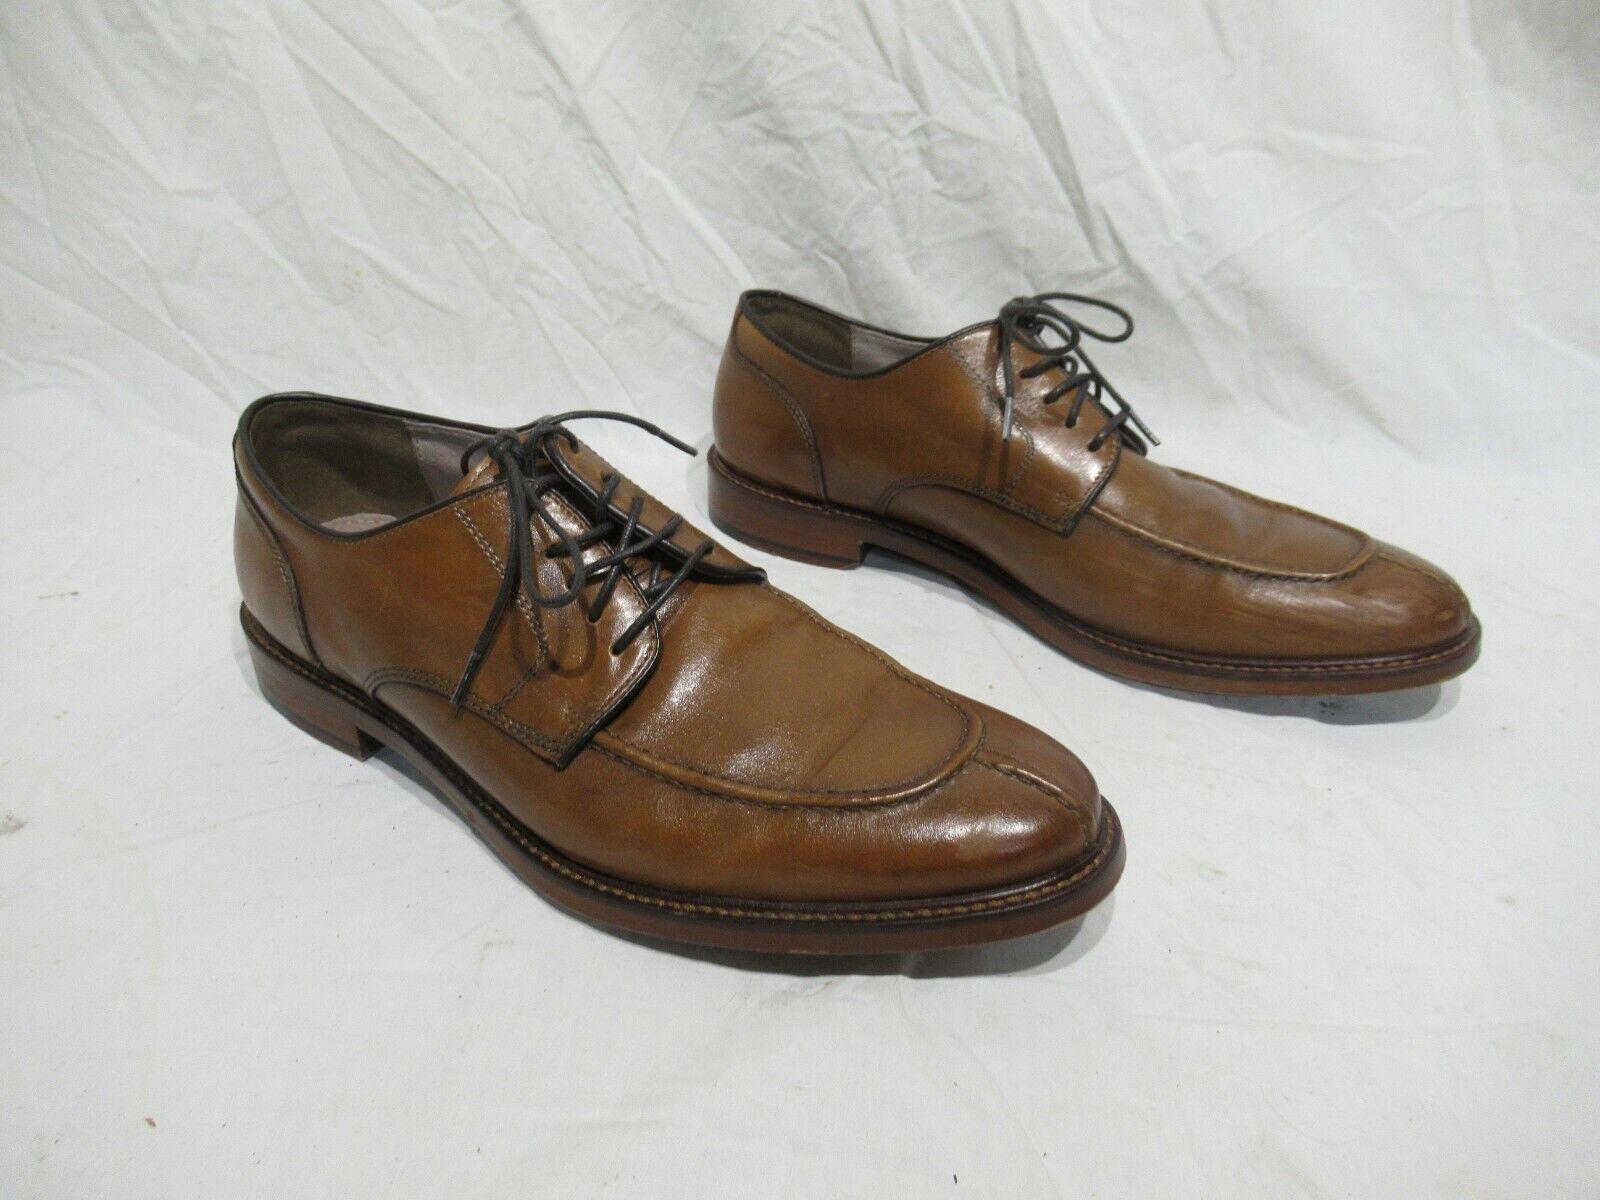 Joseph Abboud Stevenson 500372 Oxford Split Toe Brown Dress Shoes Mens Size 8.5